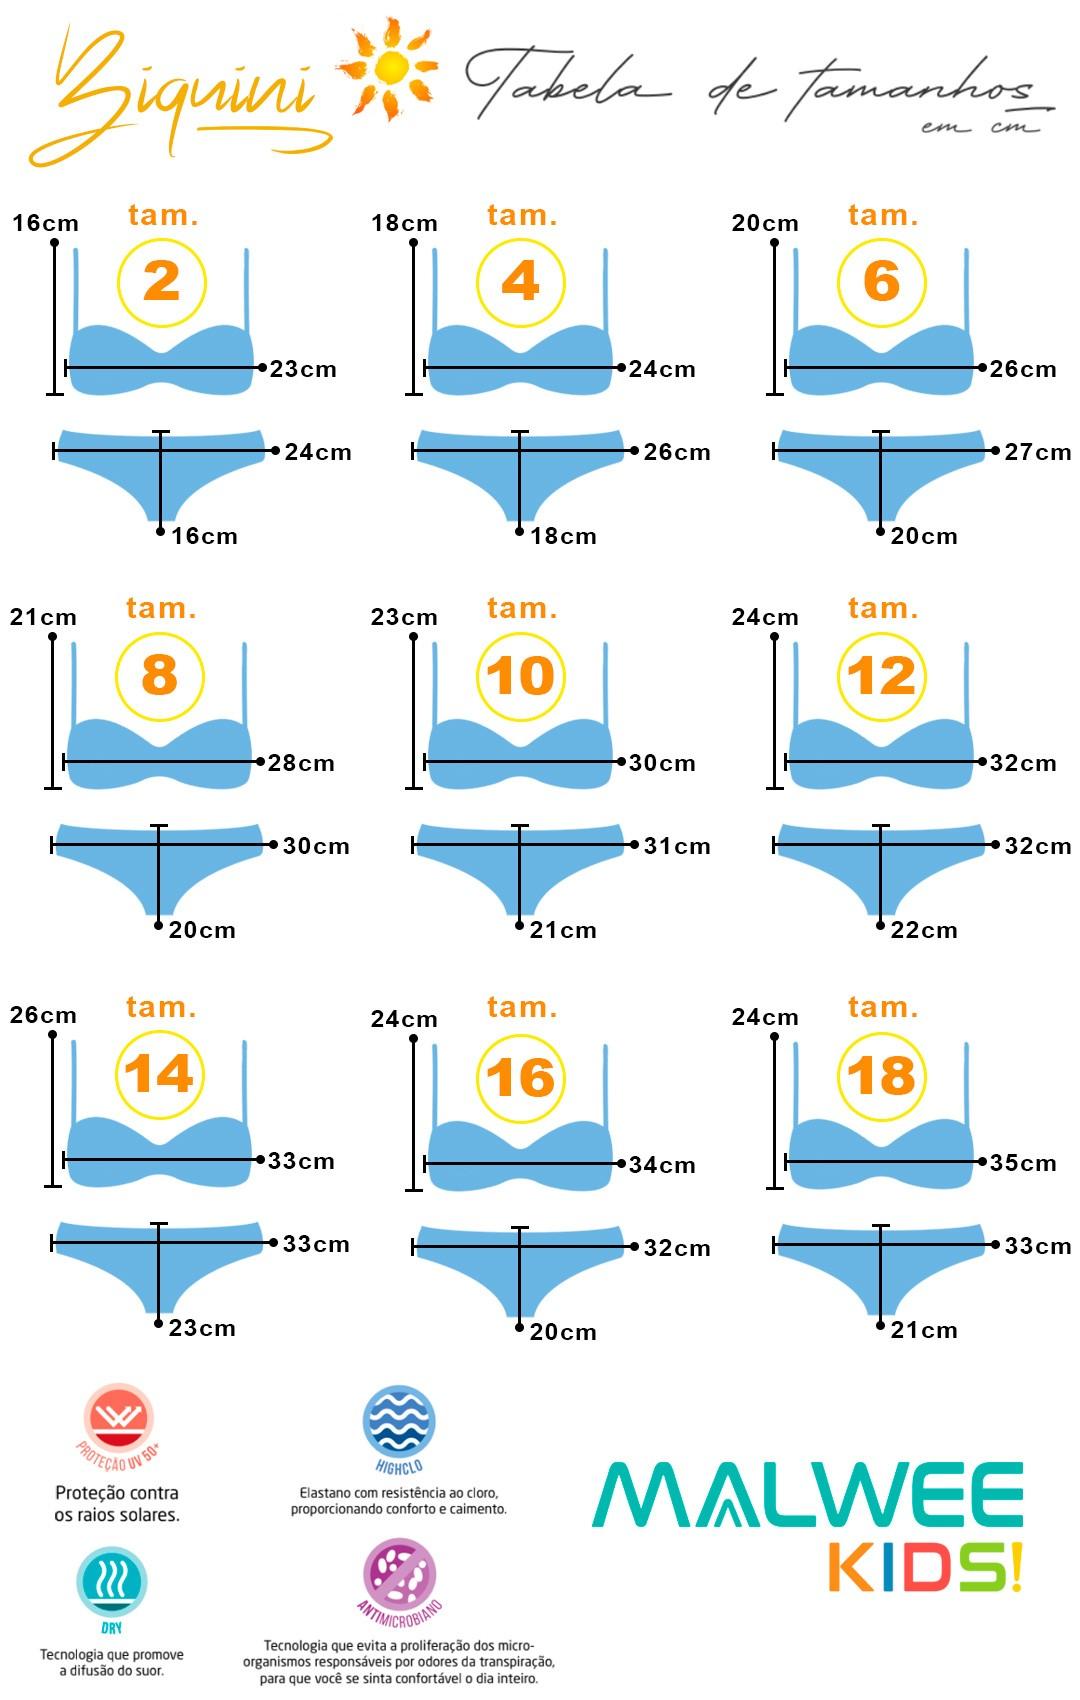 Biquini Infantil Proteção UV 50+ Rosa Seaside - Malwee: Tabela de medidas